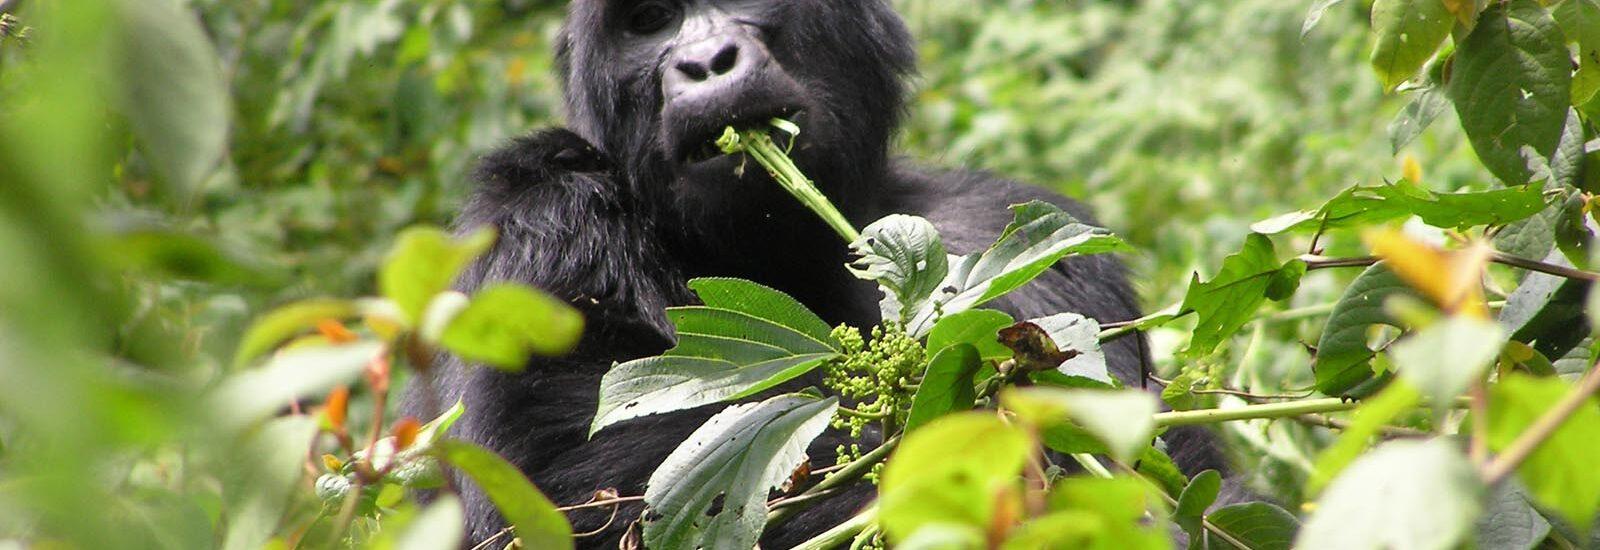 Gorilla Trekking in Uganda from Kigali